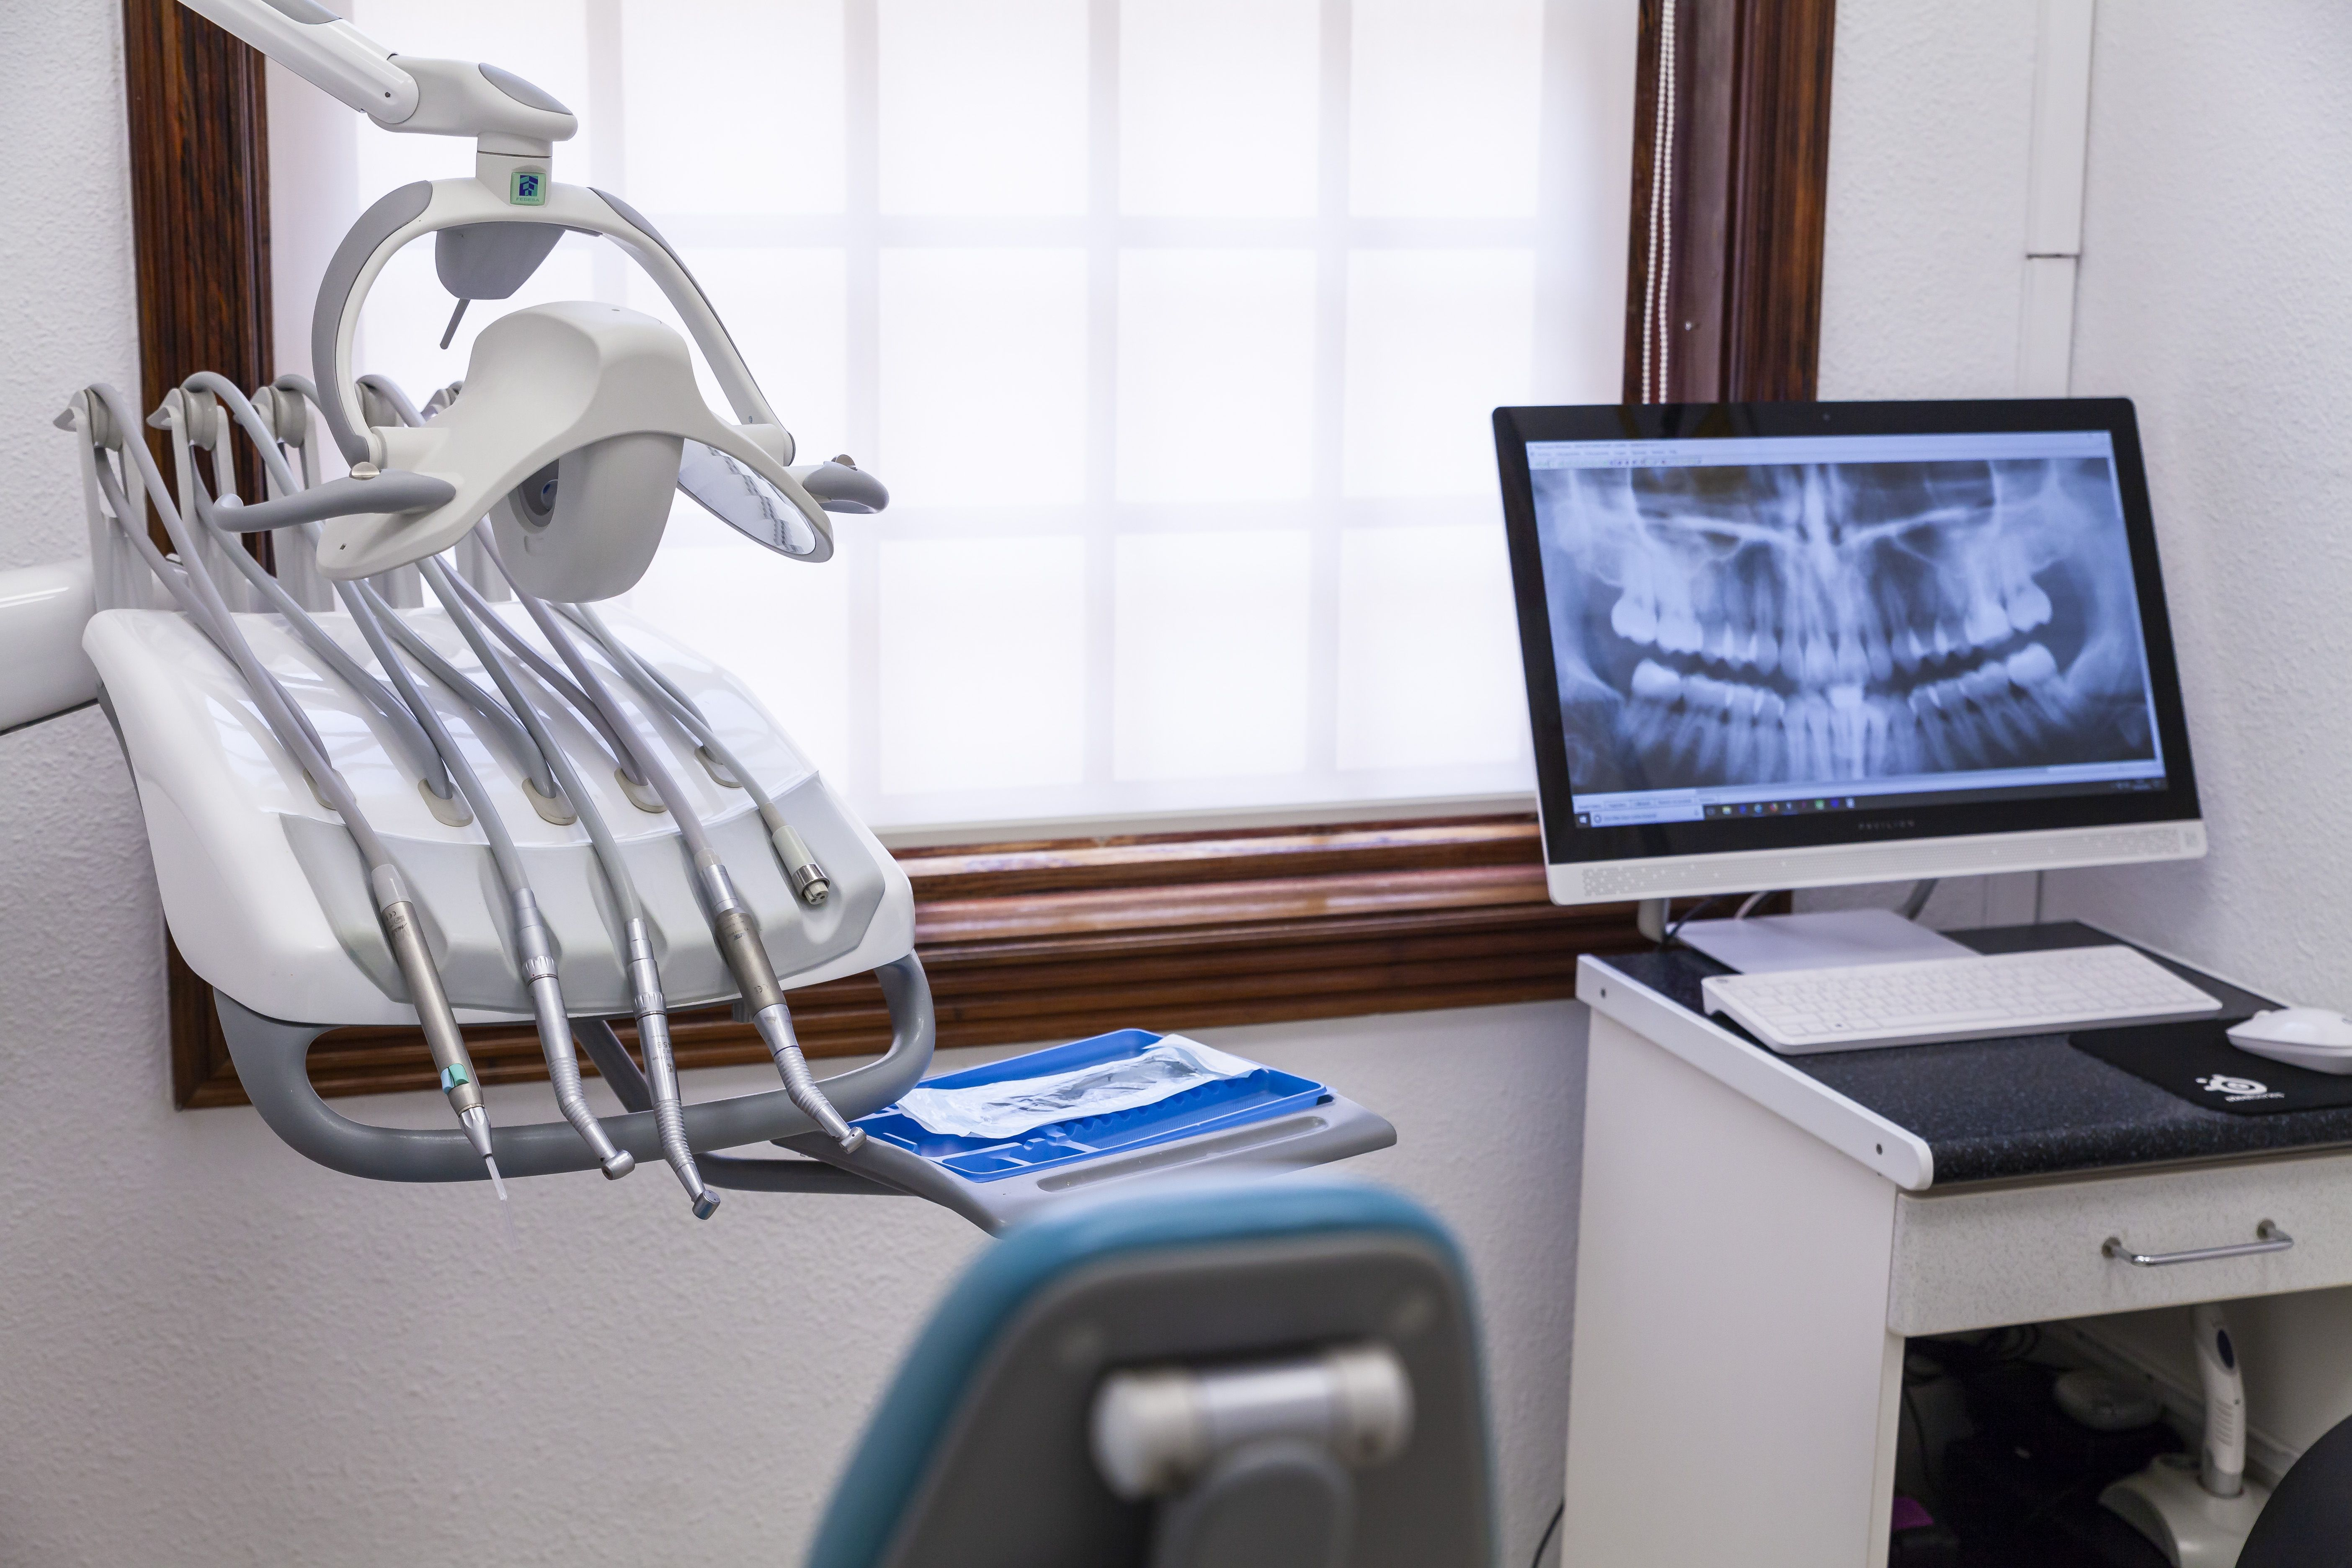 Prótesis fija con sistema Cad-Cam, prótesis removible, periodoncia...